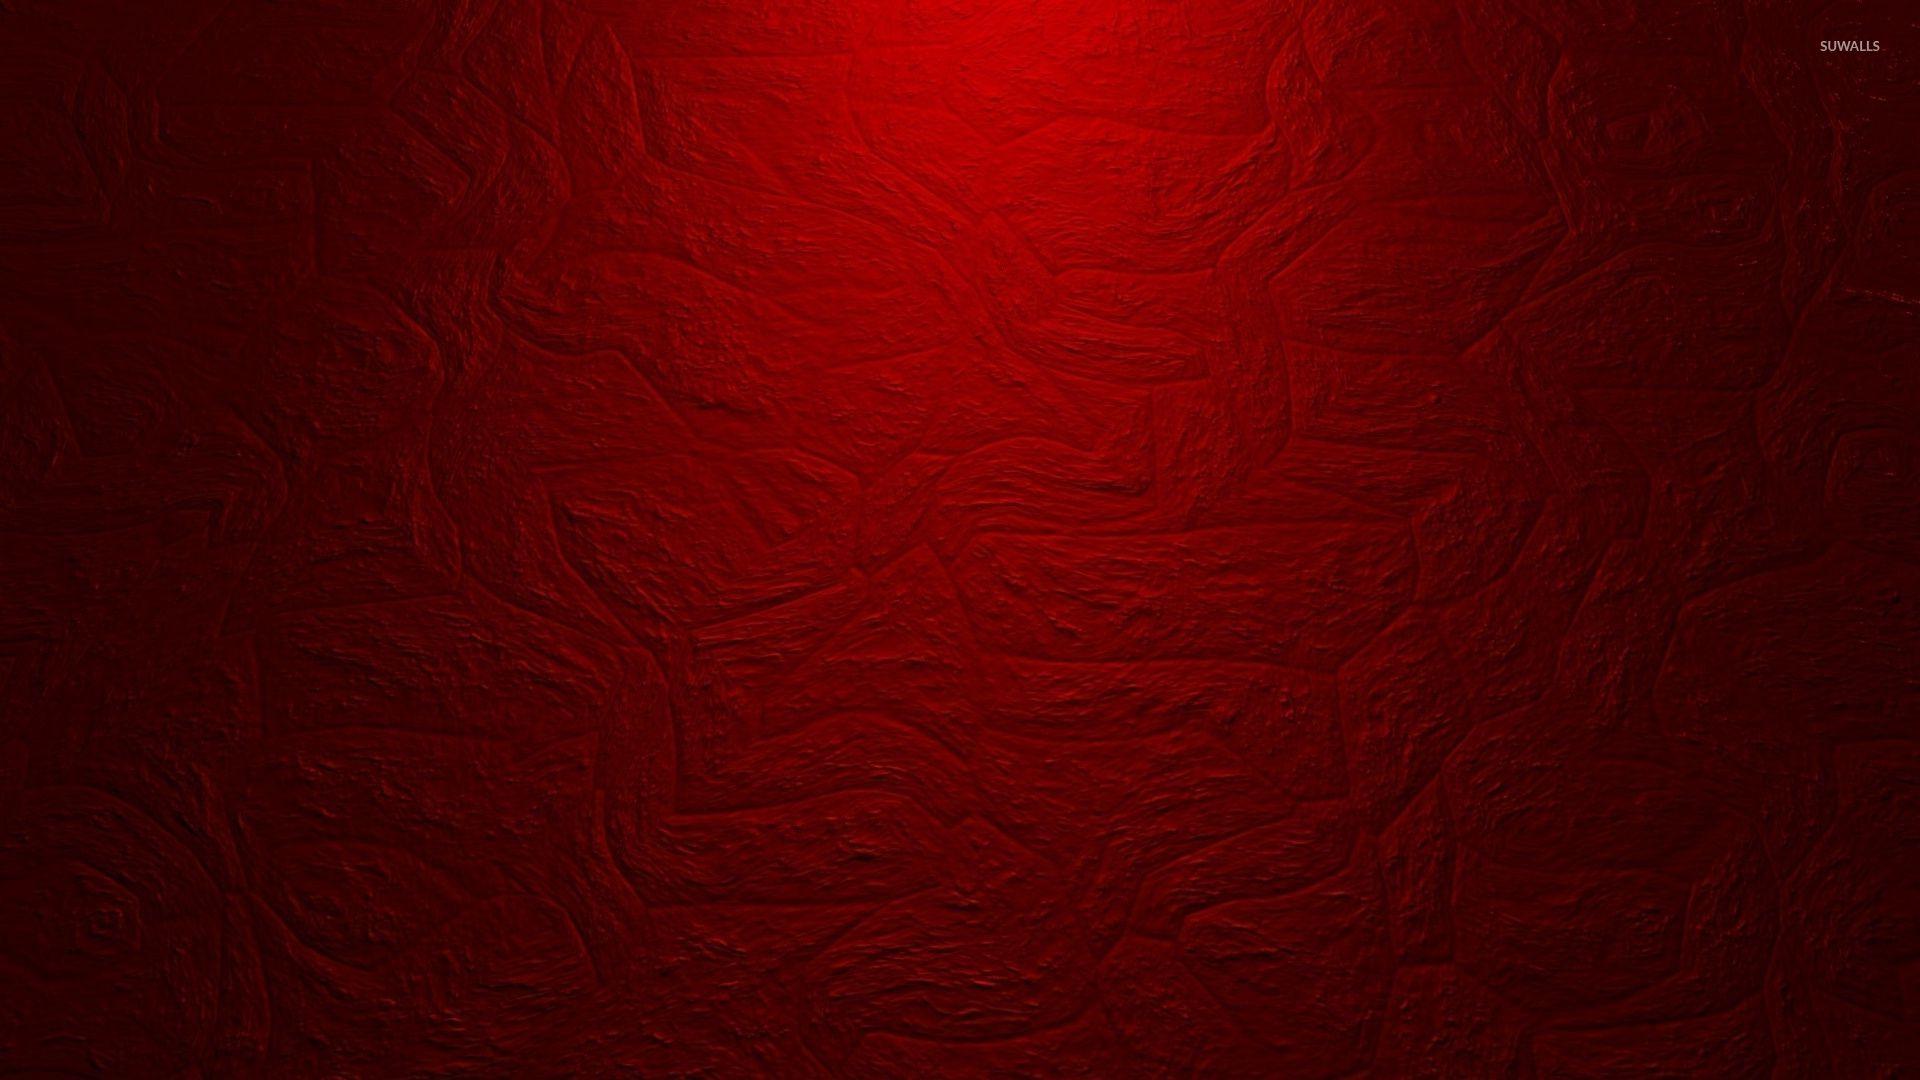 red wallpaper hd download,red,black,maroon,brown,magenta